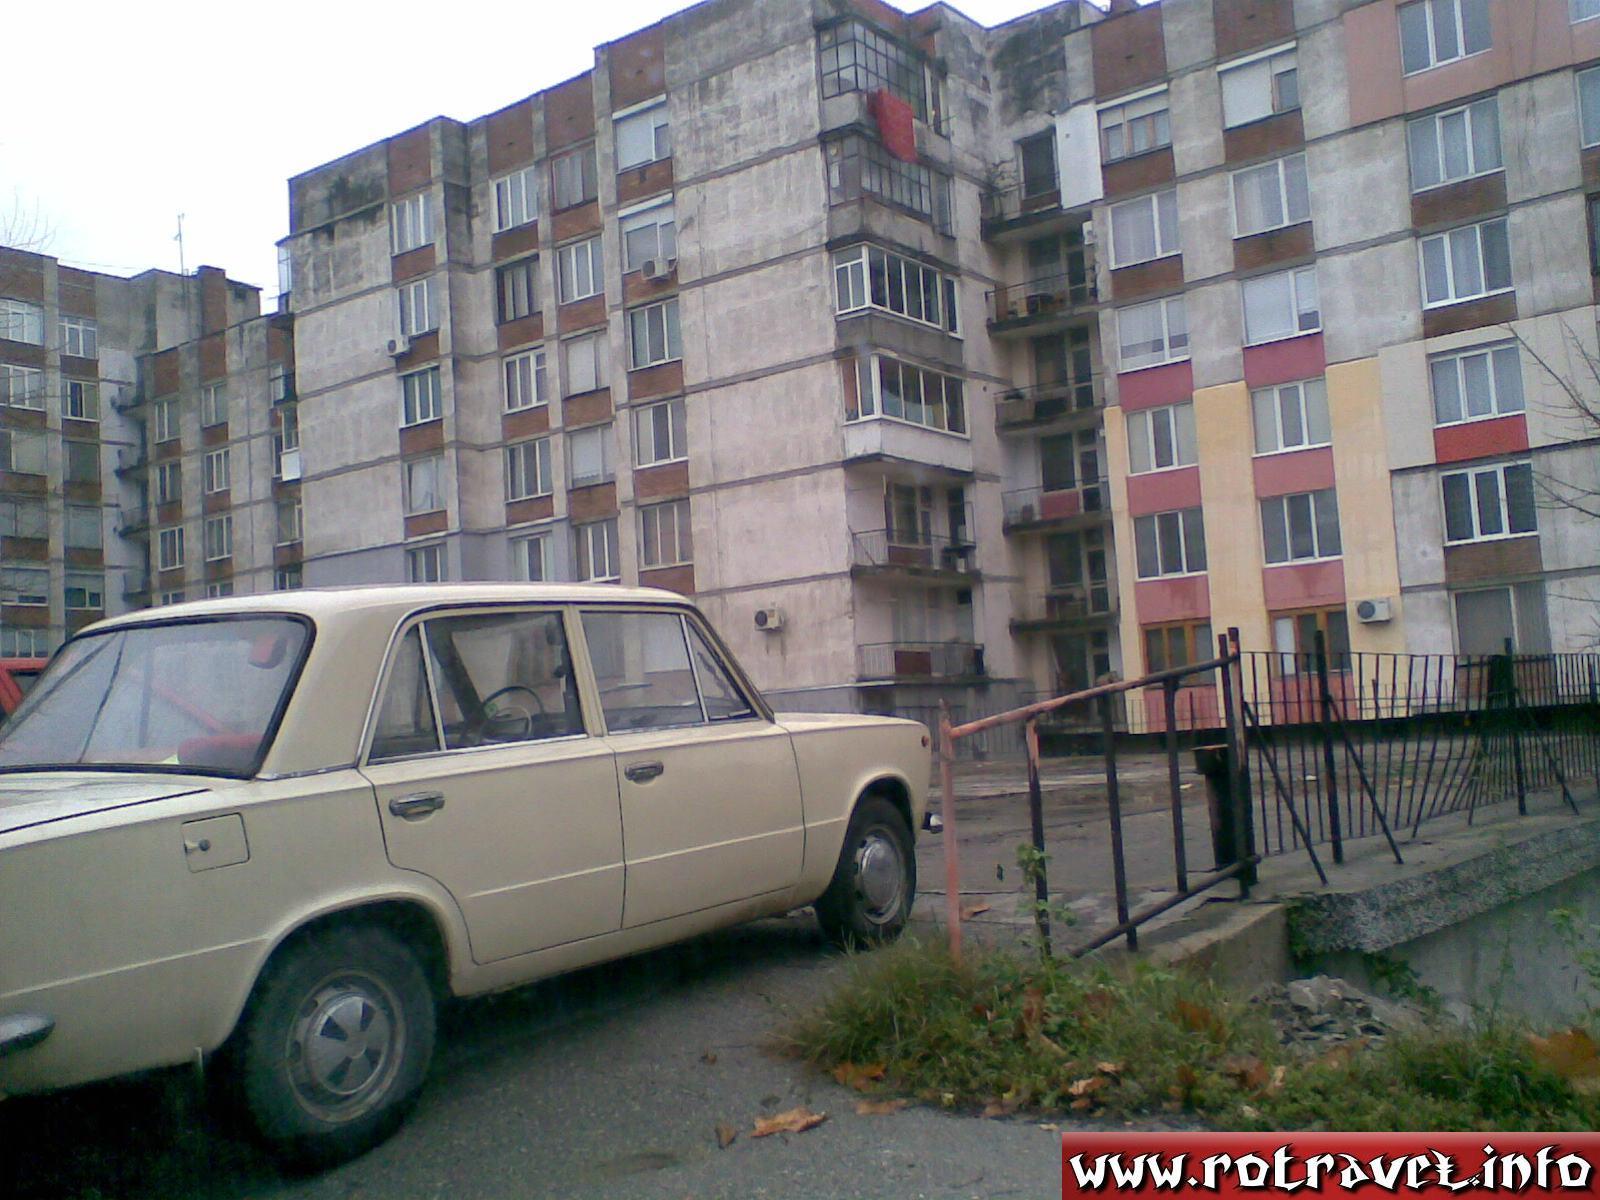 Communist blocks from the time of Todor Zhivkov